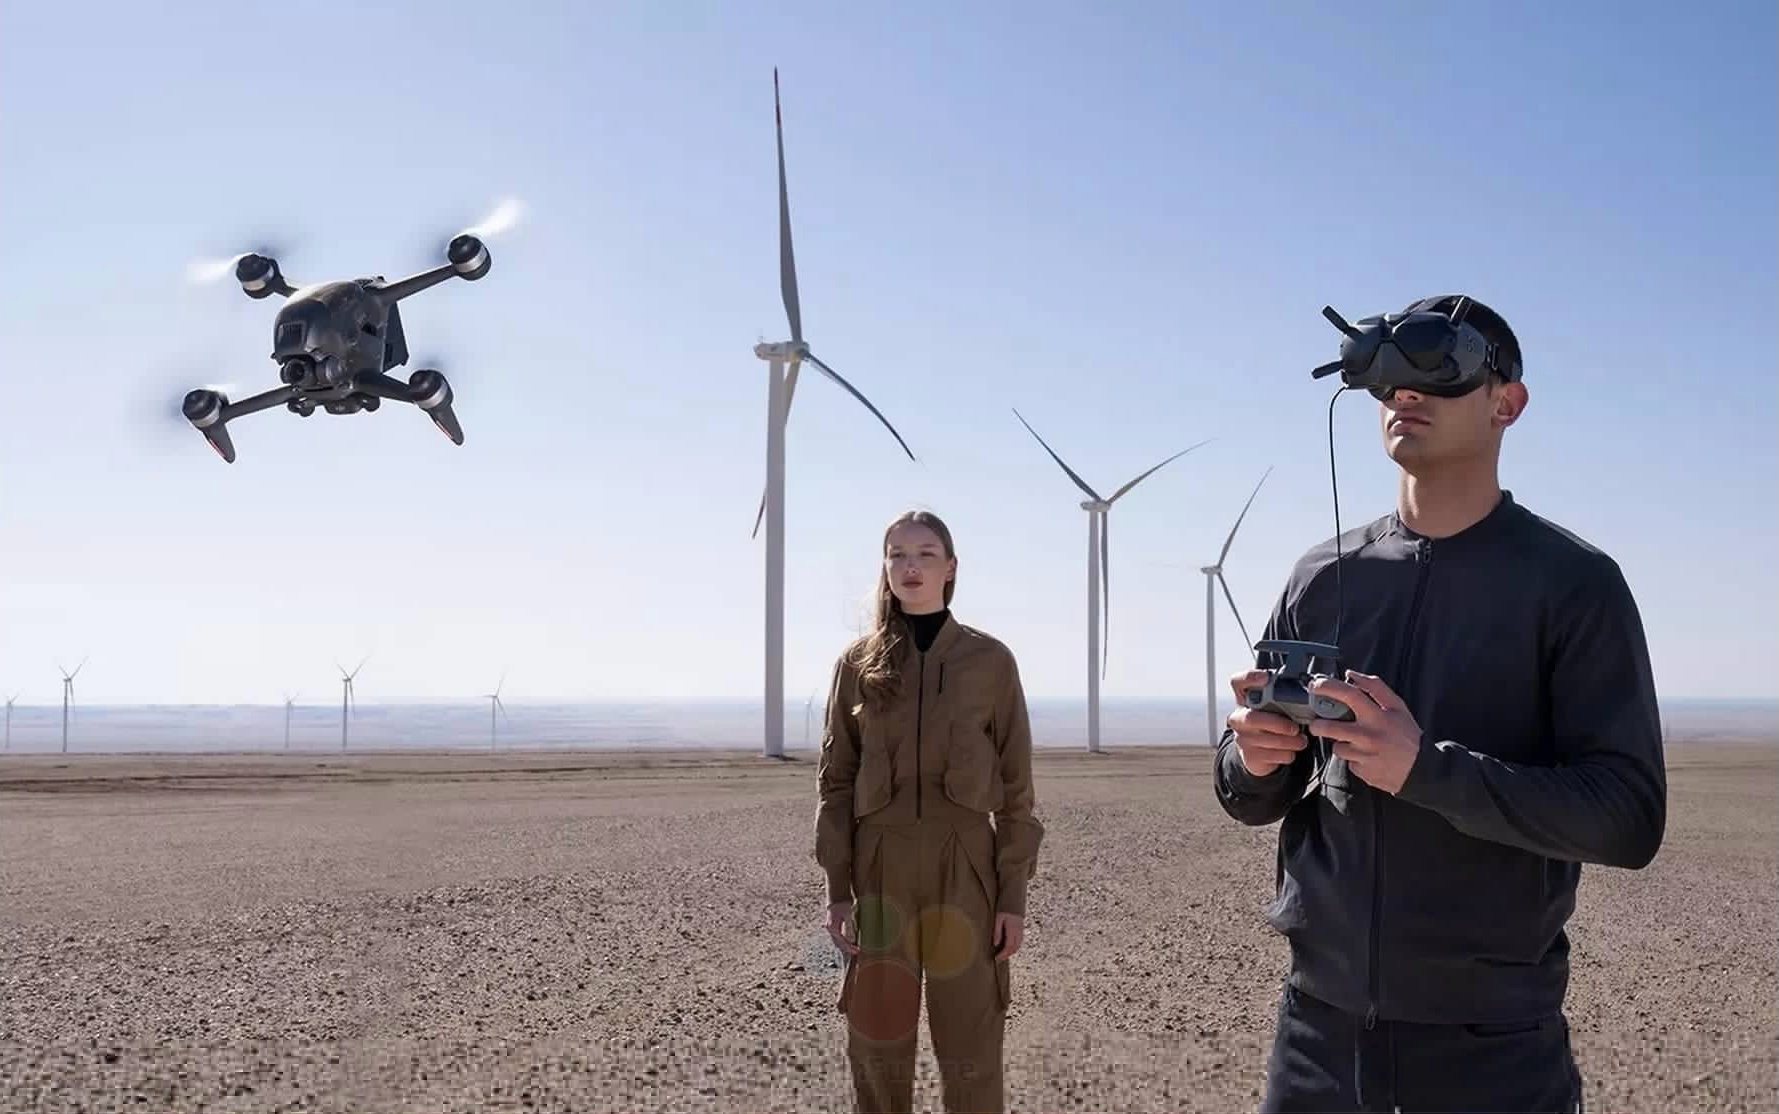 DJI FPV Drohne